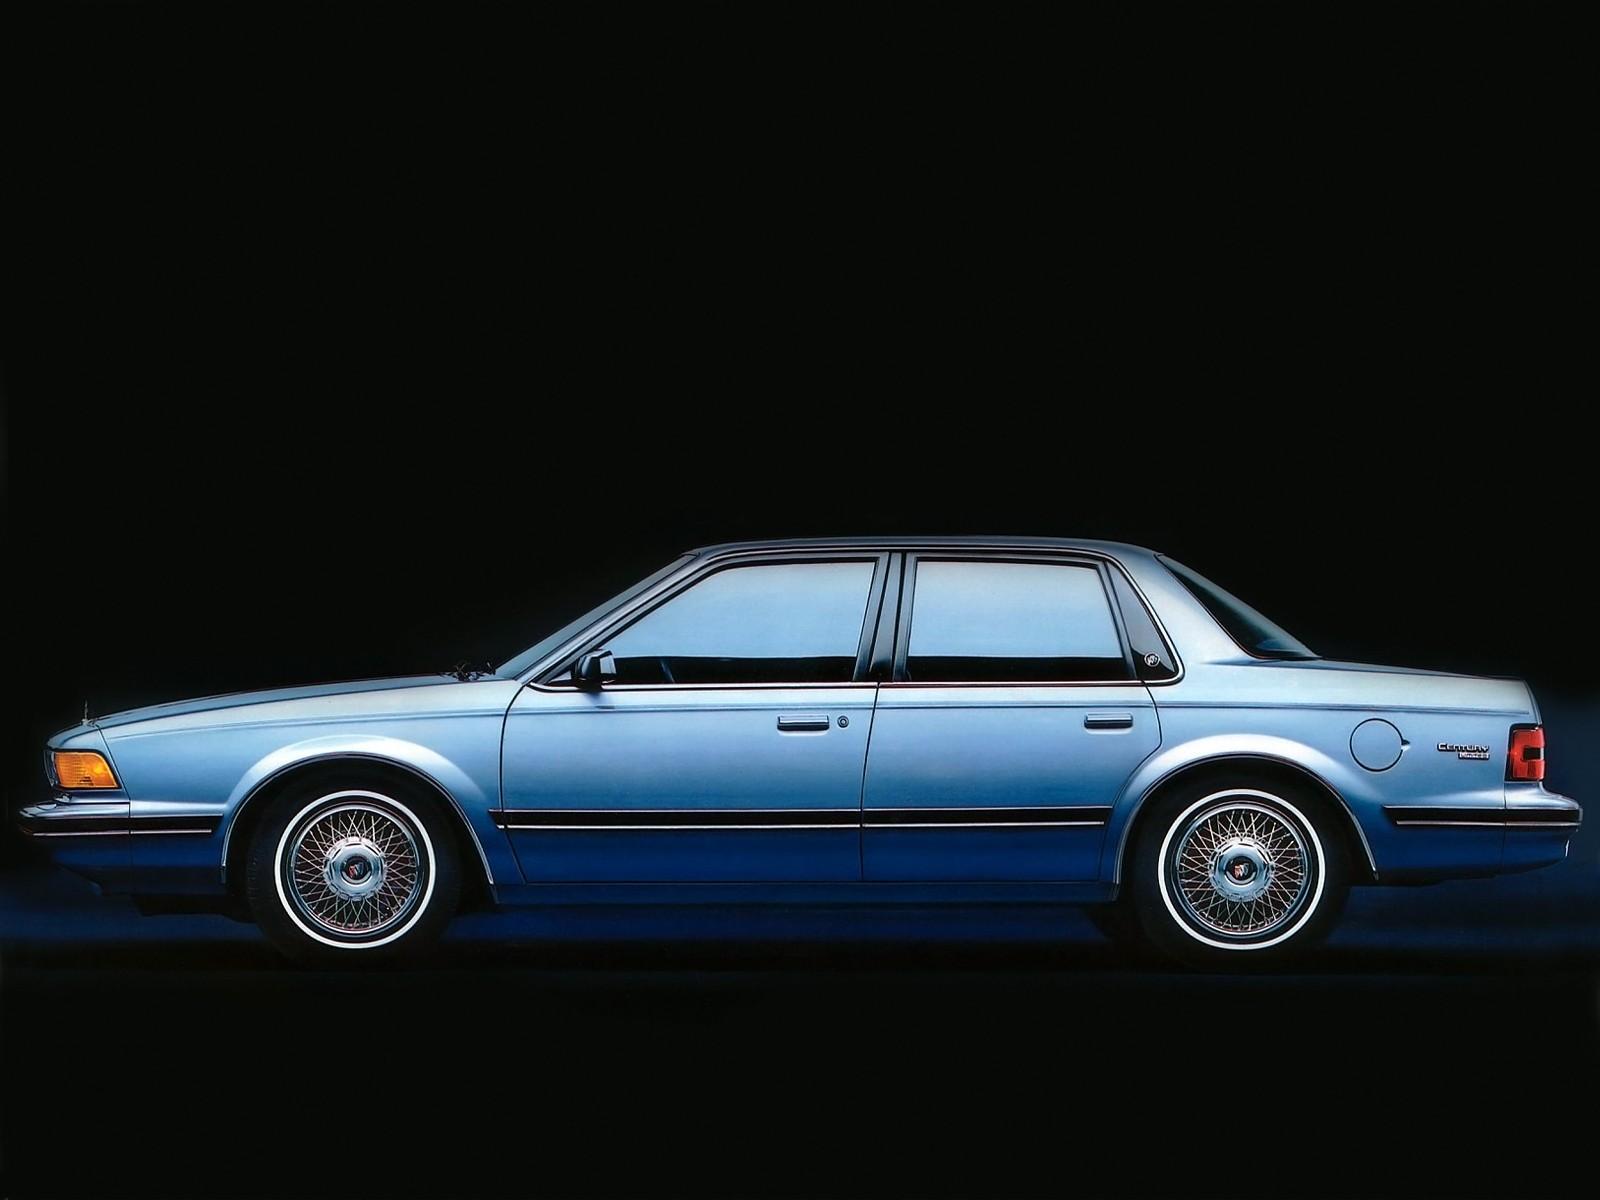 buick century specs photos 1989 1990 1991 1992 1993 1994 1995 1996 autoevolution buick century specs photos 1989